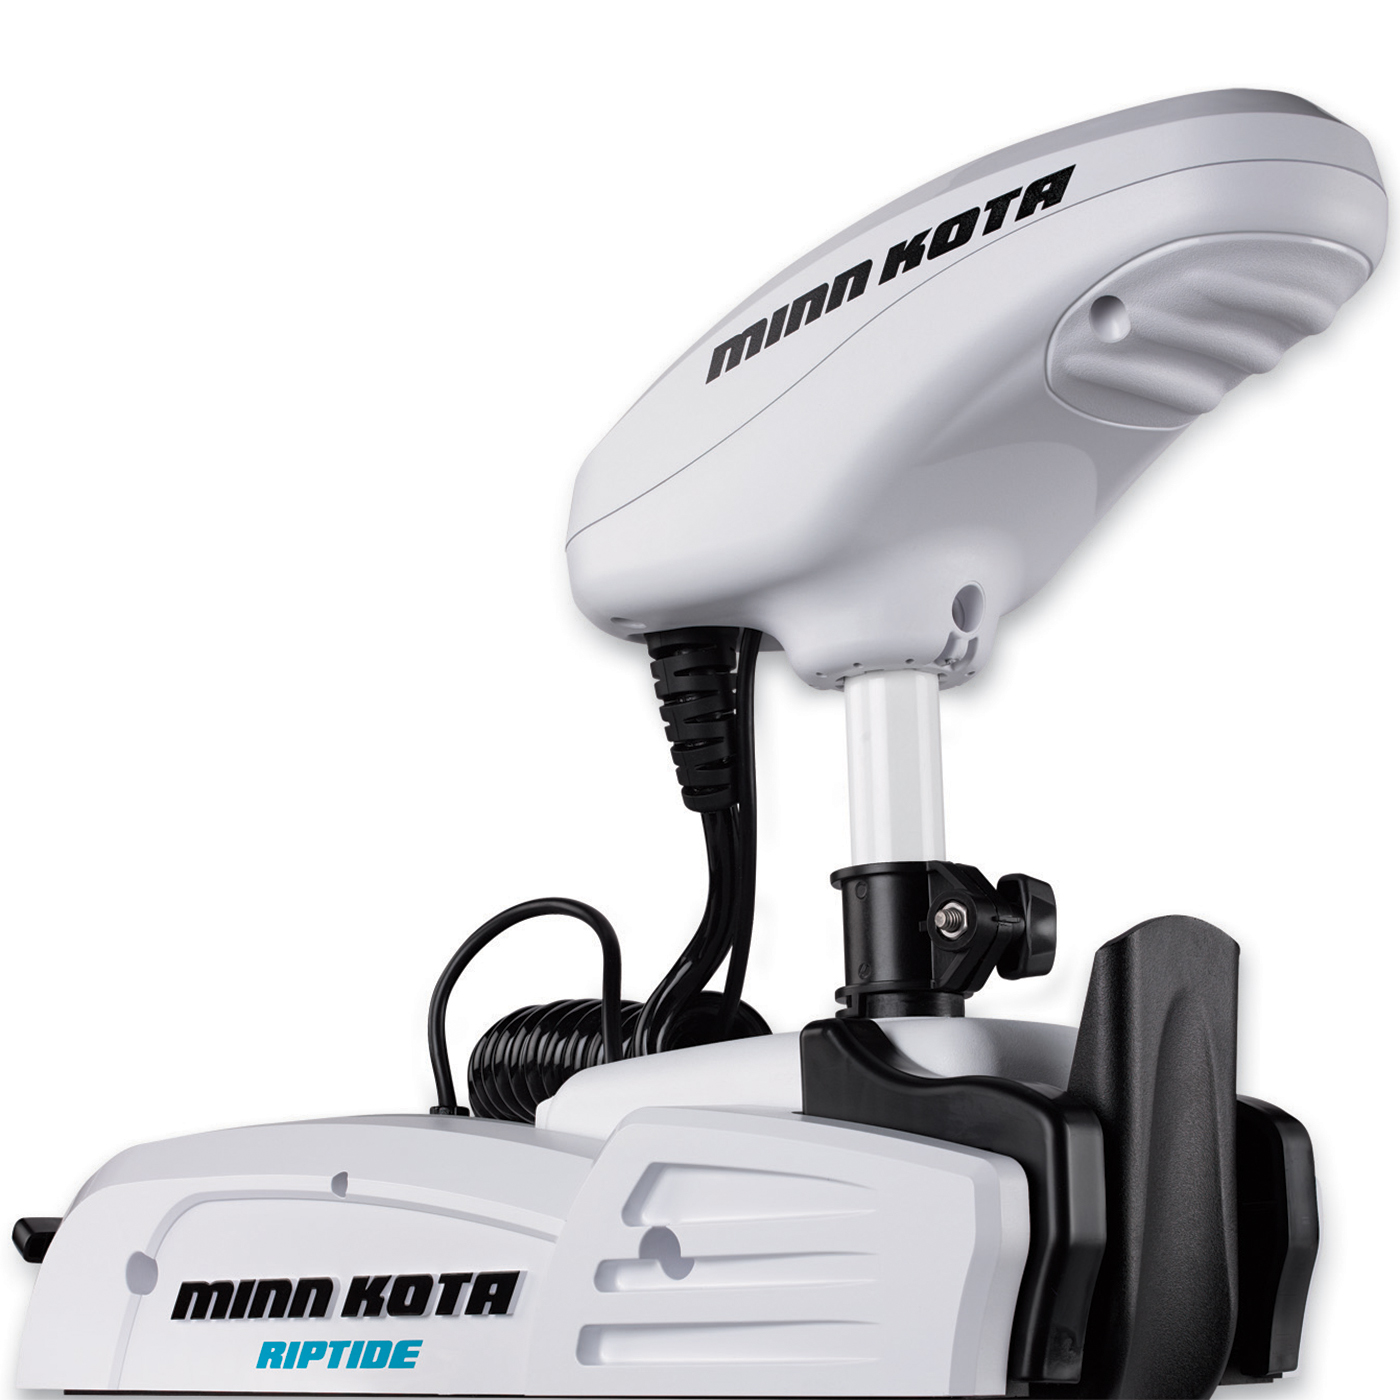 Minn Kota Riptide PowerDrive Bluetooth Saltwater Bow-Mount Trolling Motor